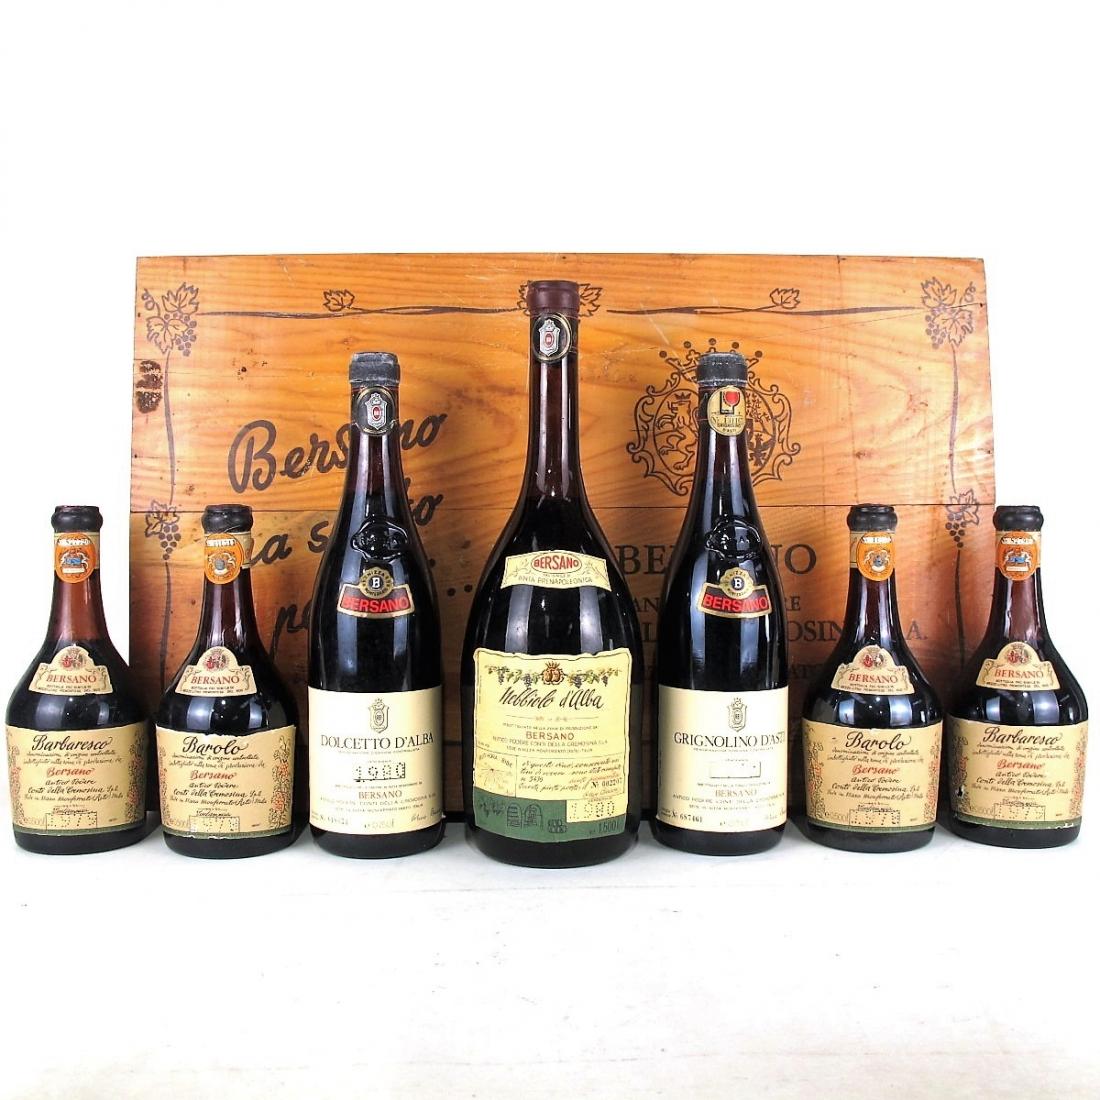 Bersano Selection & Presentation Box / 7 Bottles Various Sizes